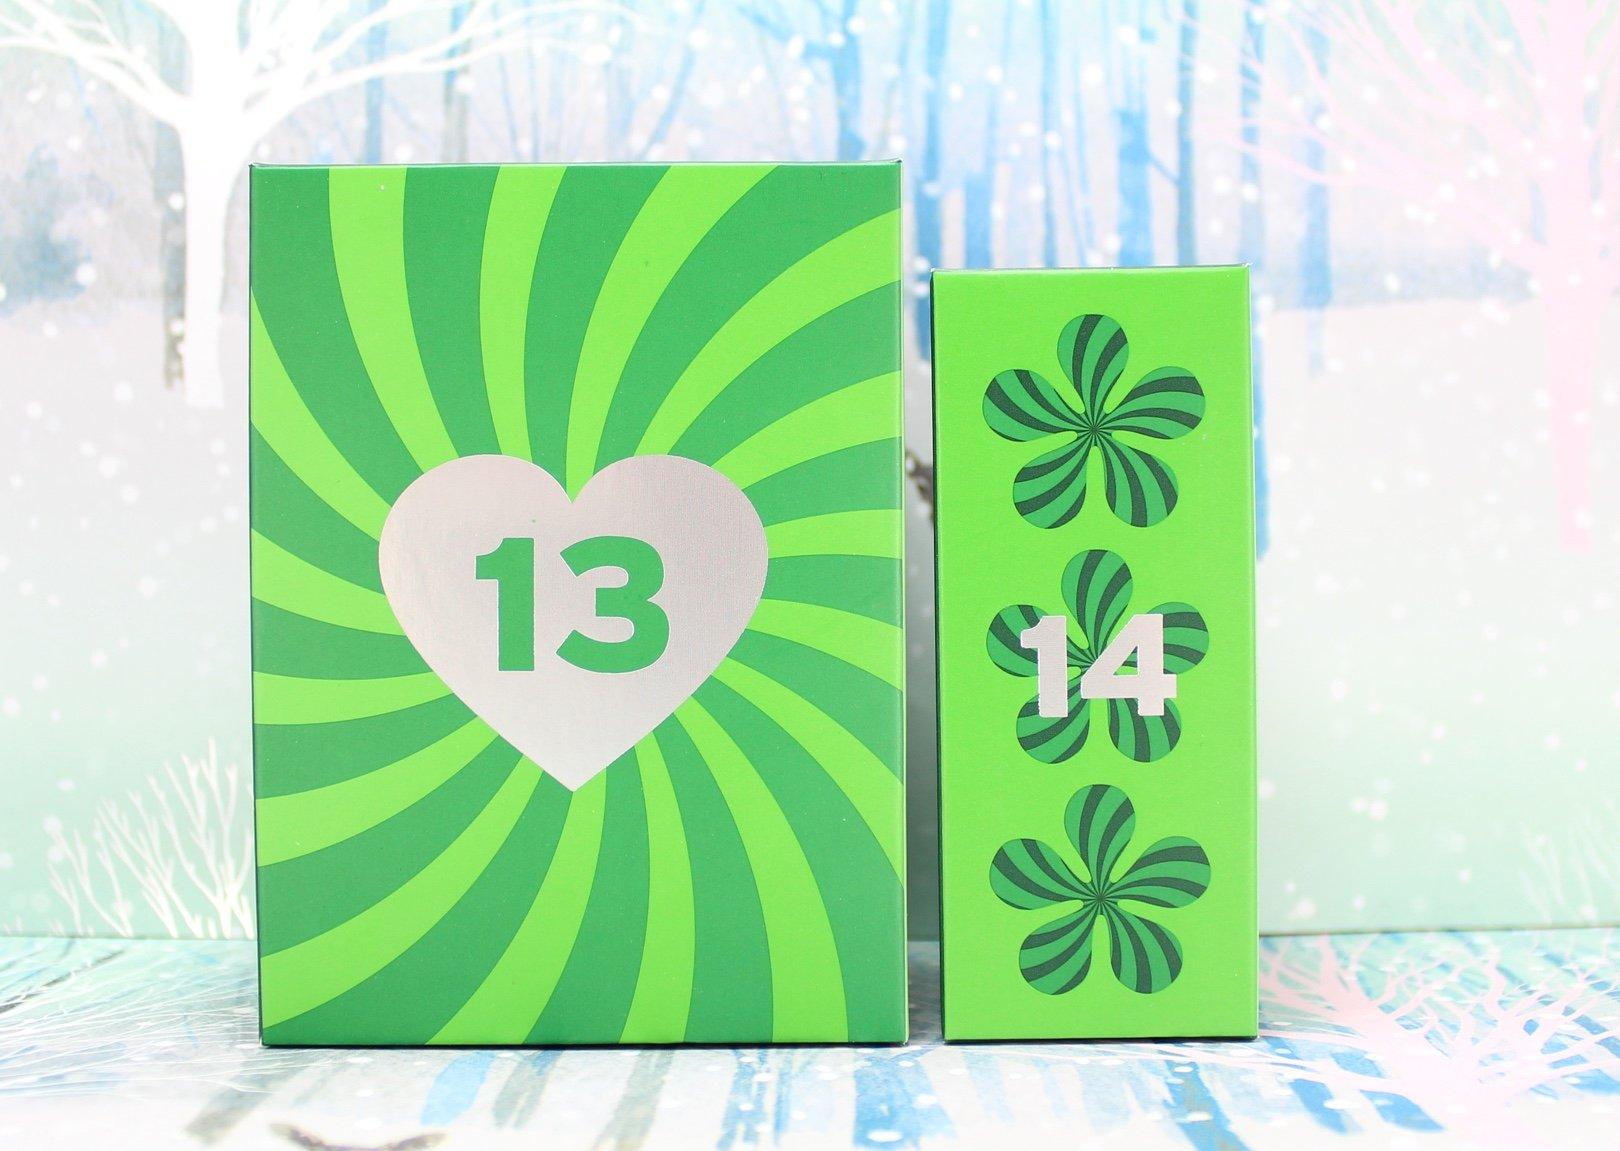 The Body Shop Deluxe Advent Calendar: Days 13-14